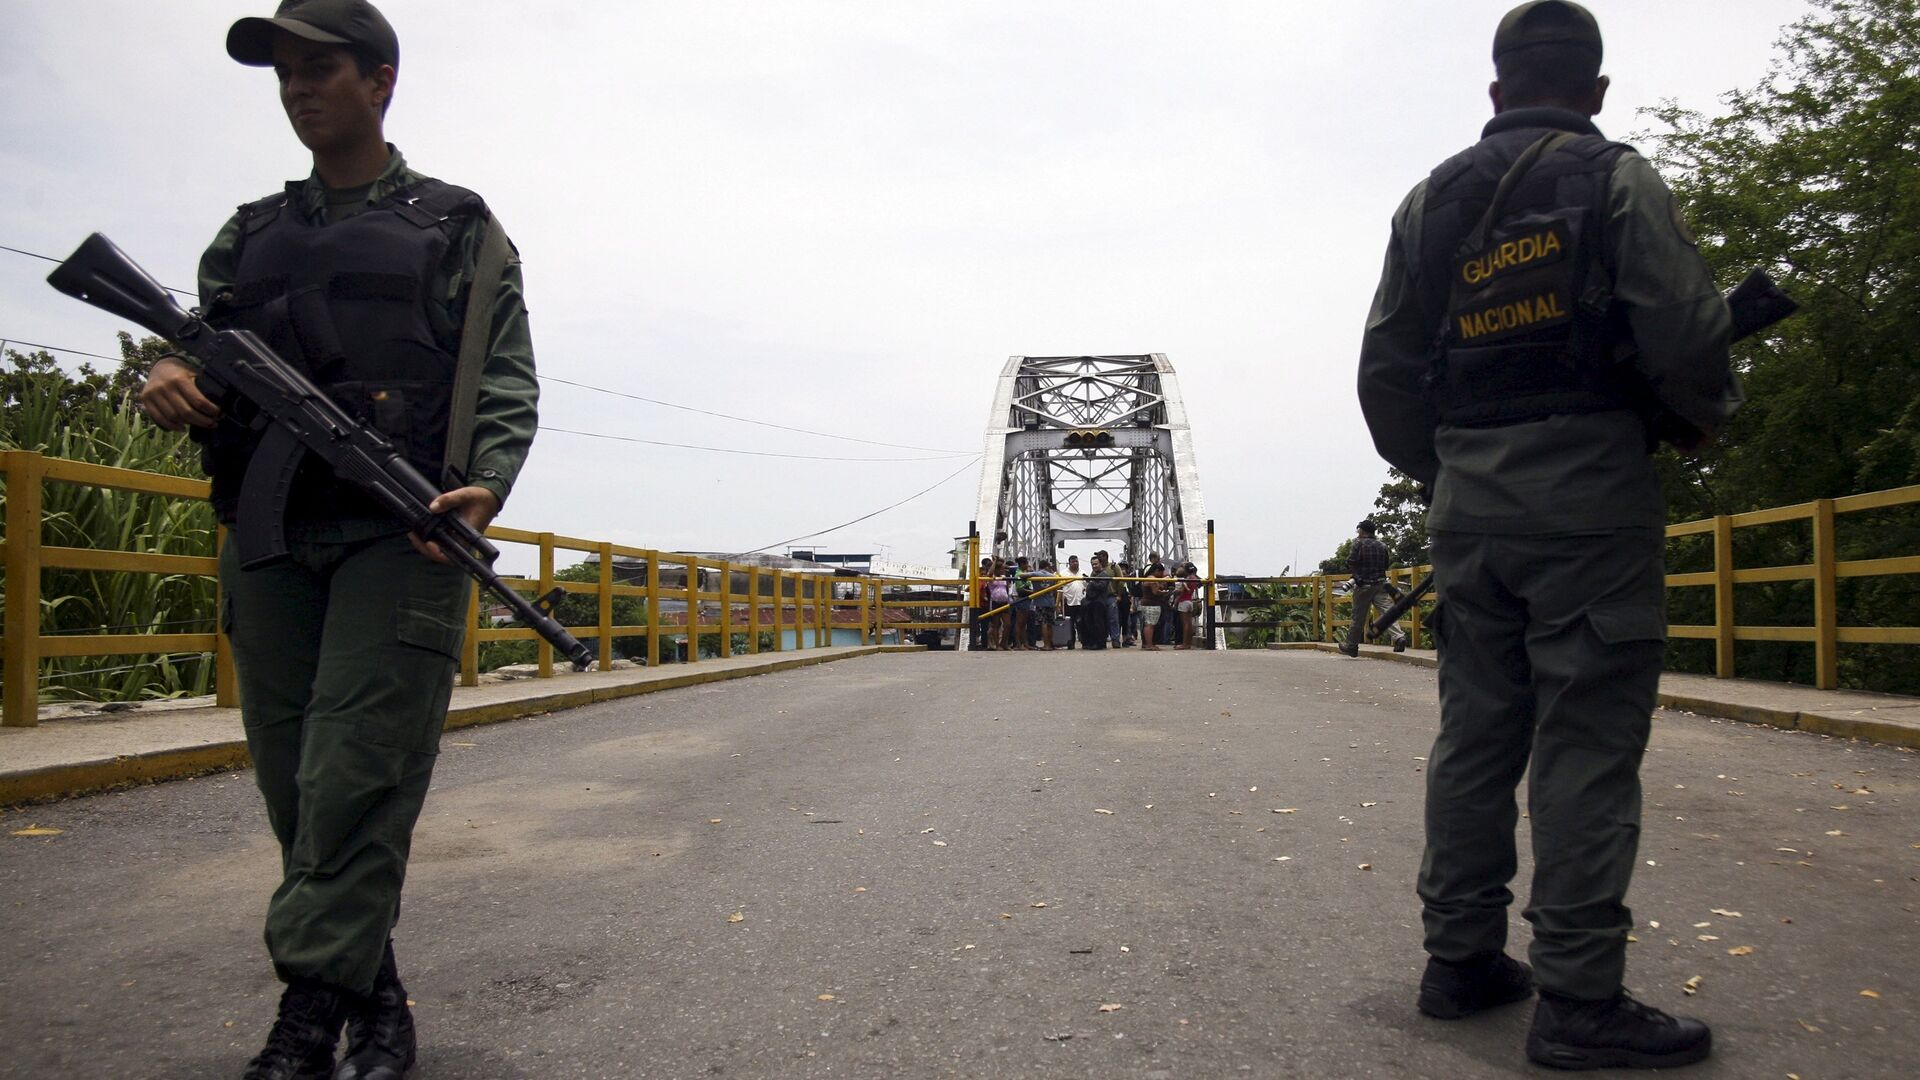 Venezuela's National Guards stand guard at the closed international bridge La Union, on the border with Colombia - Sputnik Mundo, 1920, 25.05.2021